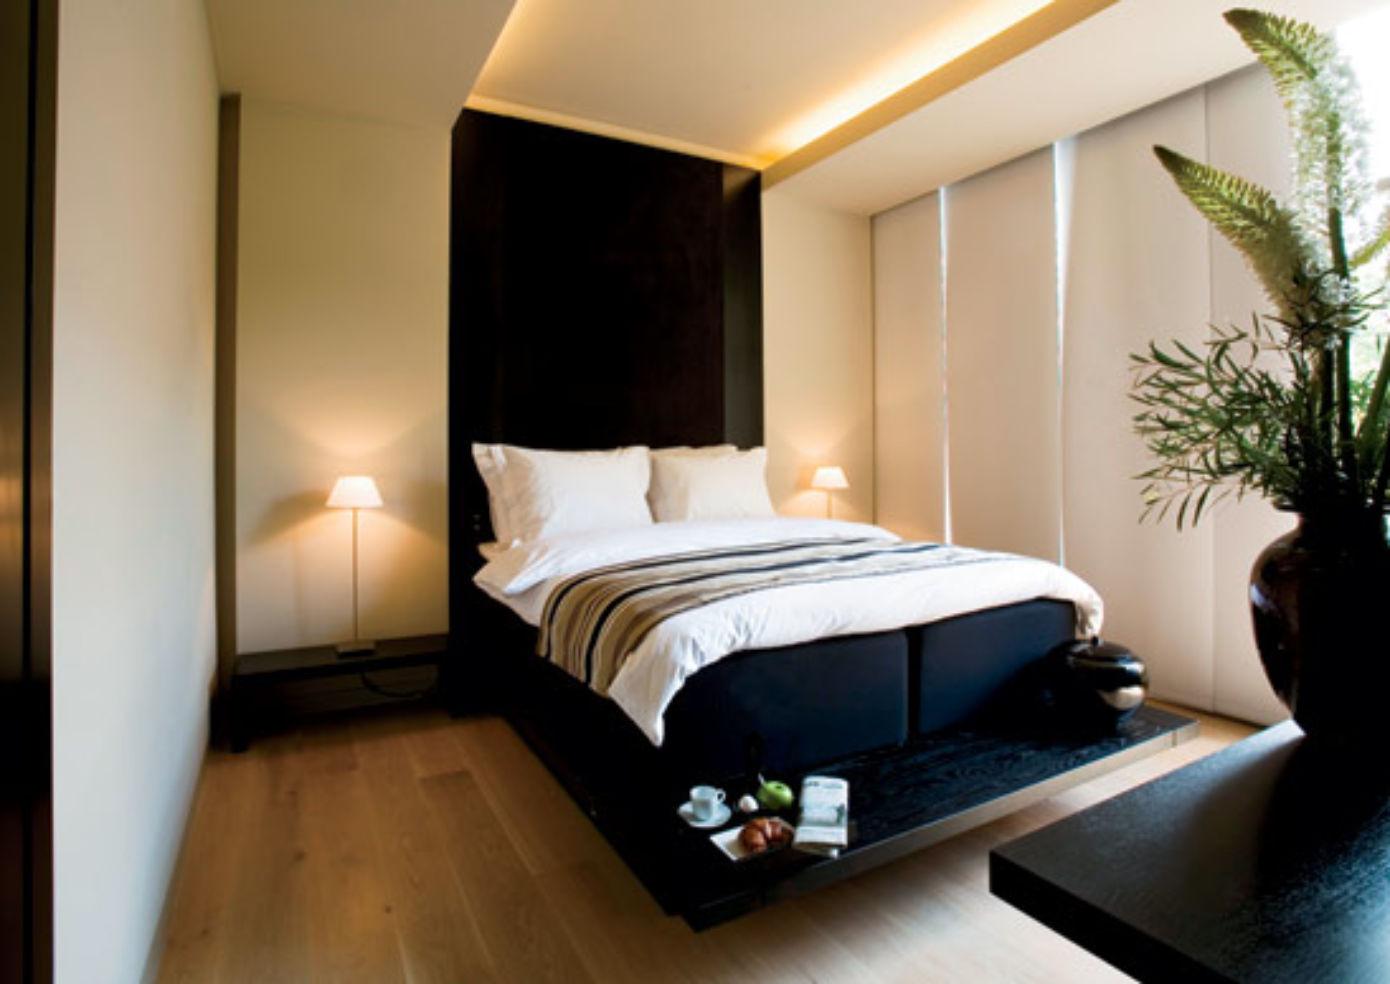 Boutique hotel patou photos budget travel for Hip hotels budget